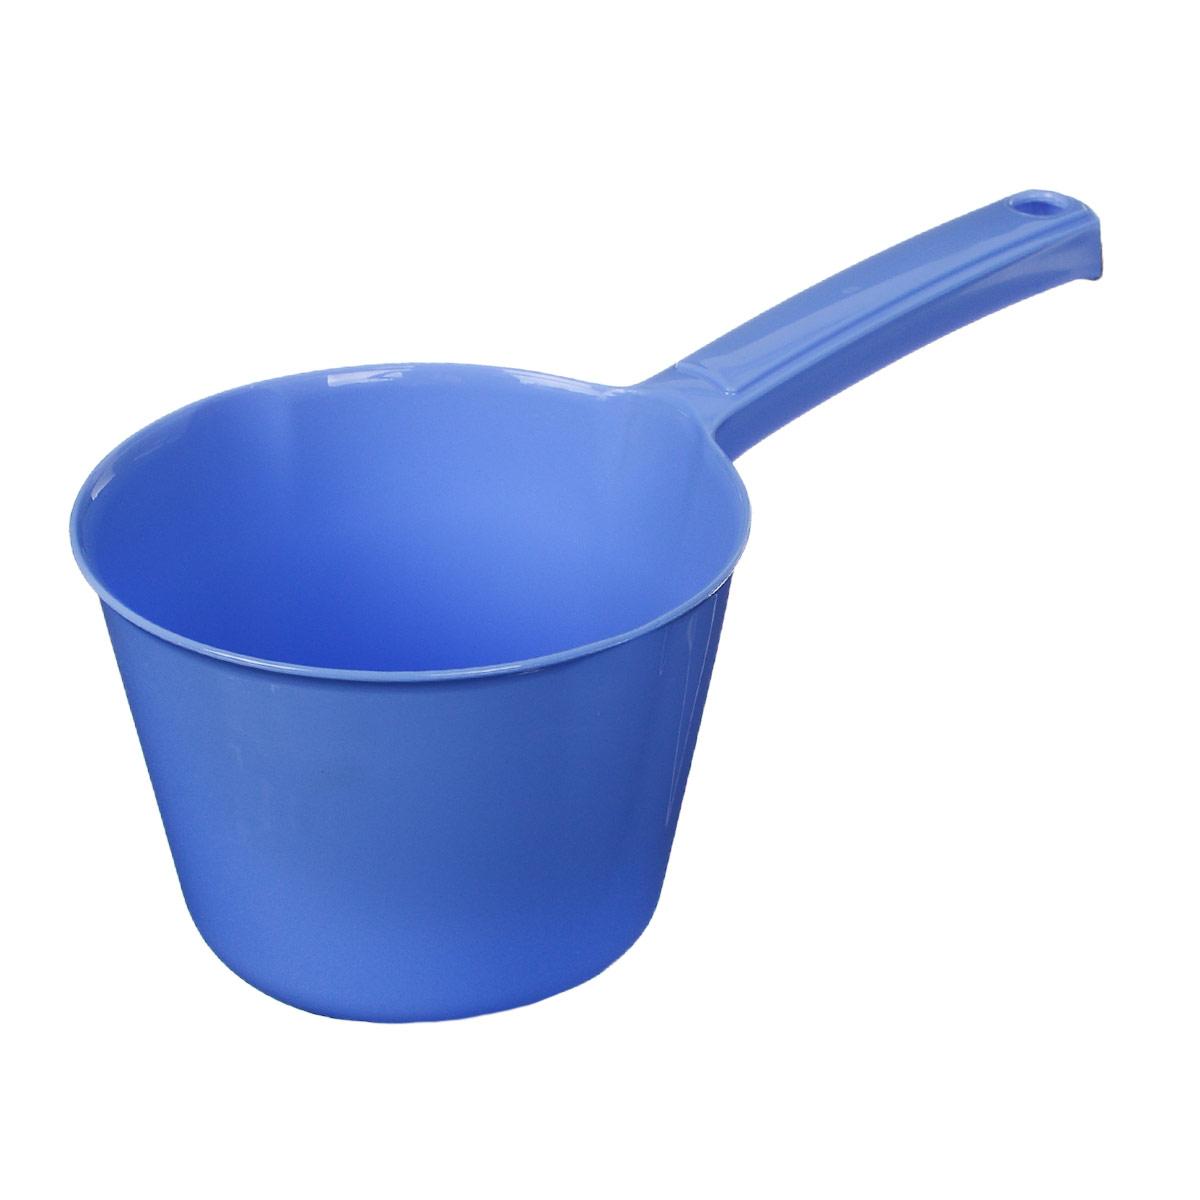 Ковш Idea, цвет: голубой, 1 л ковш idea 1 л фиолетовый